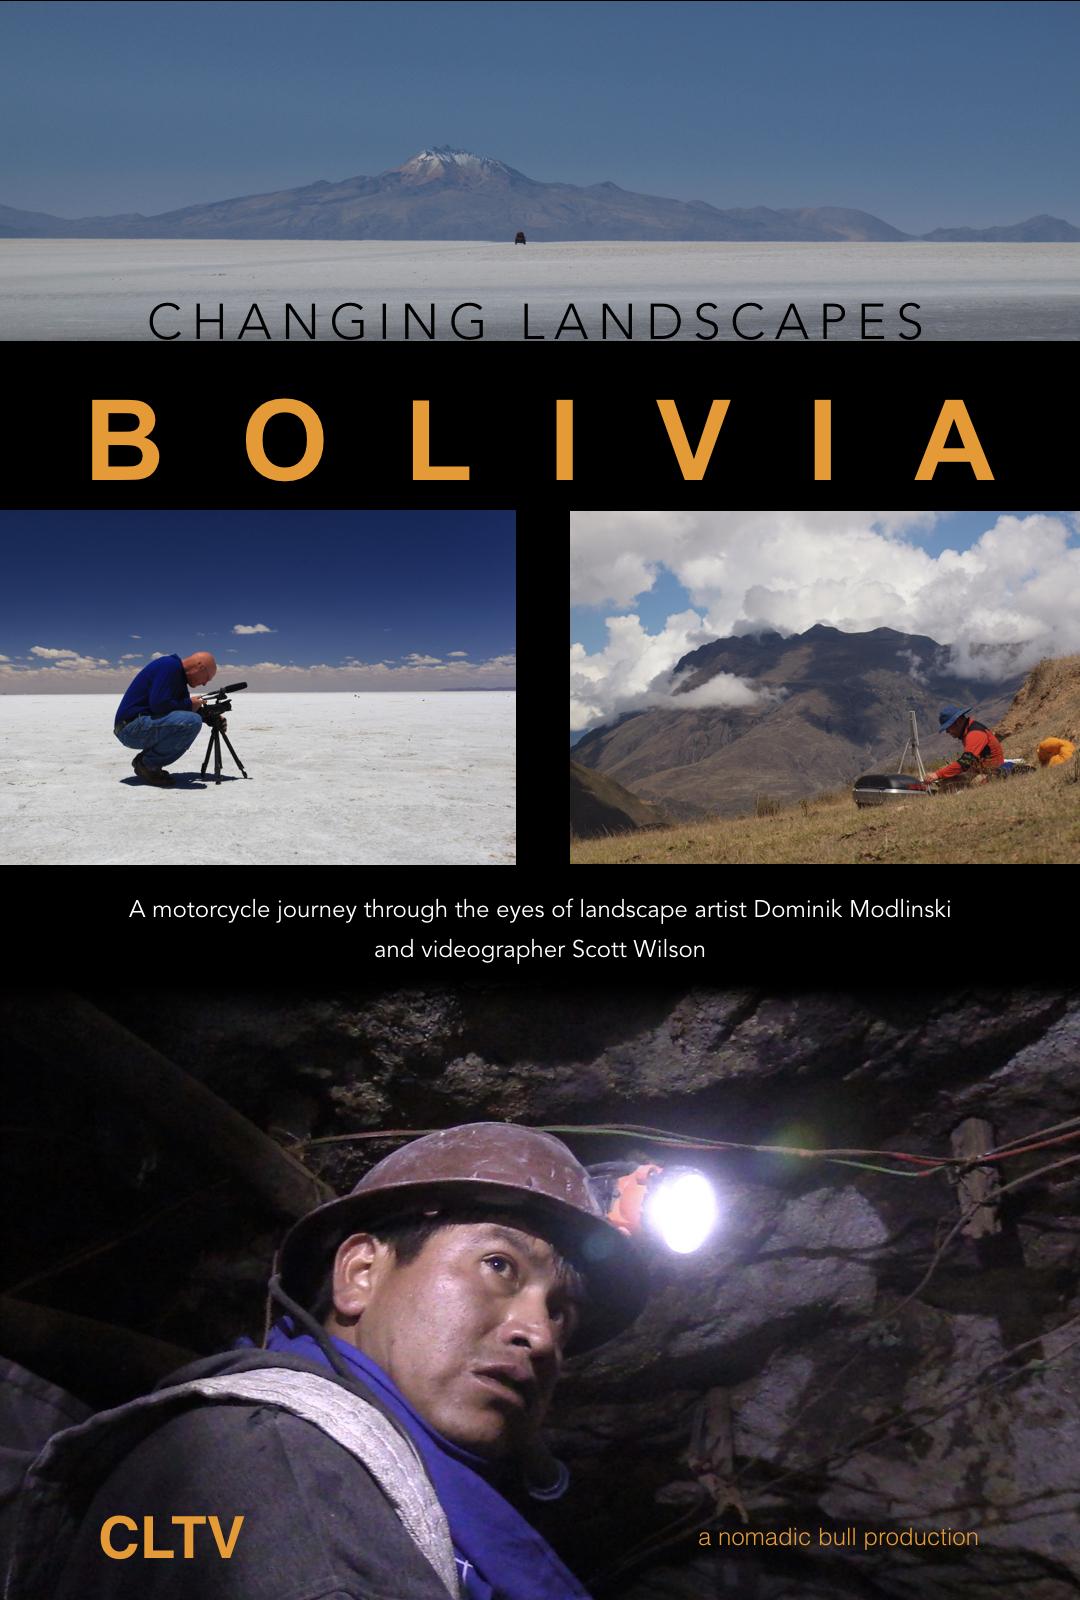 Bolivia - An 8 part series